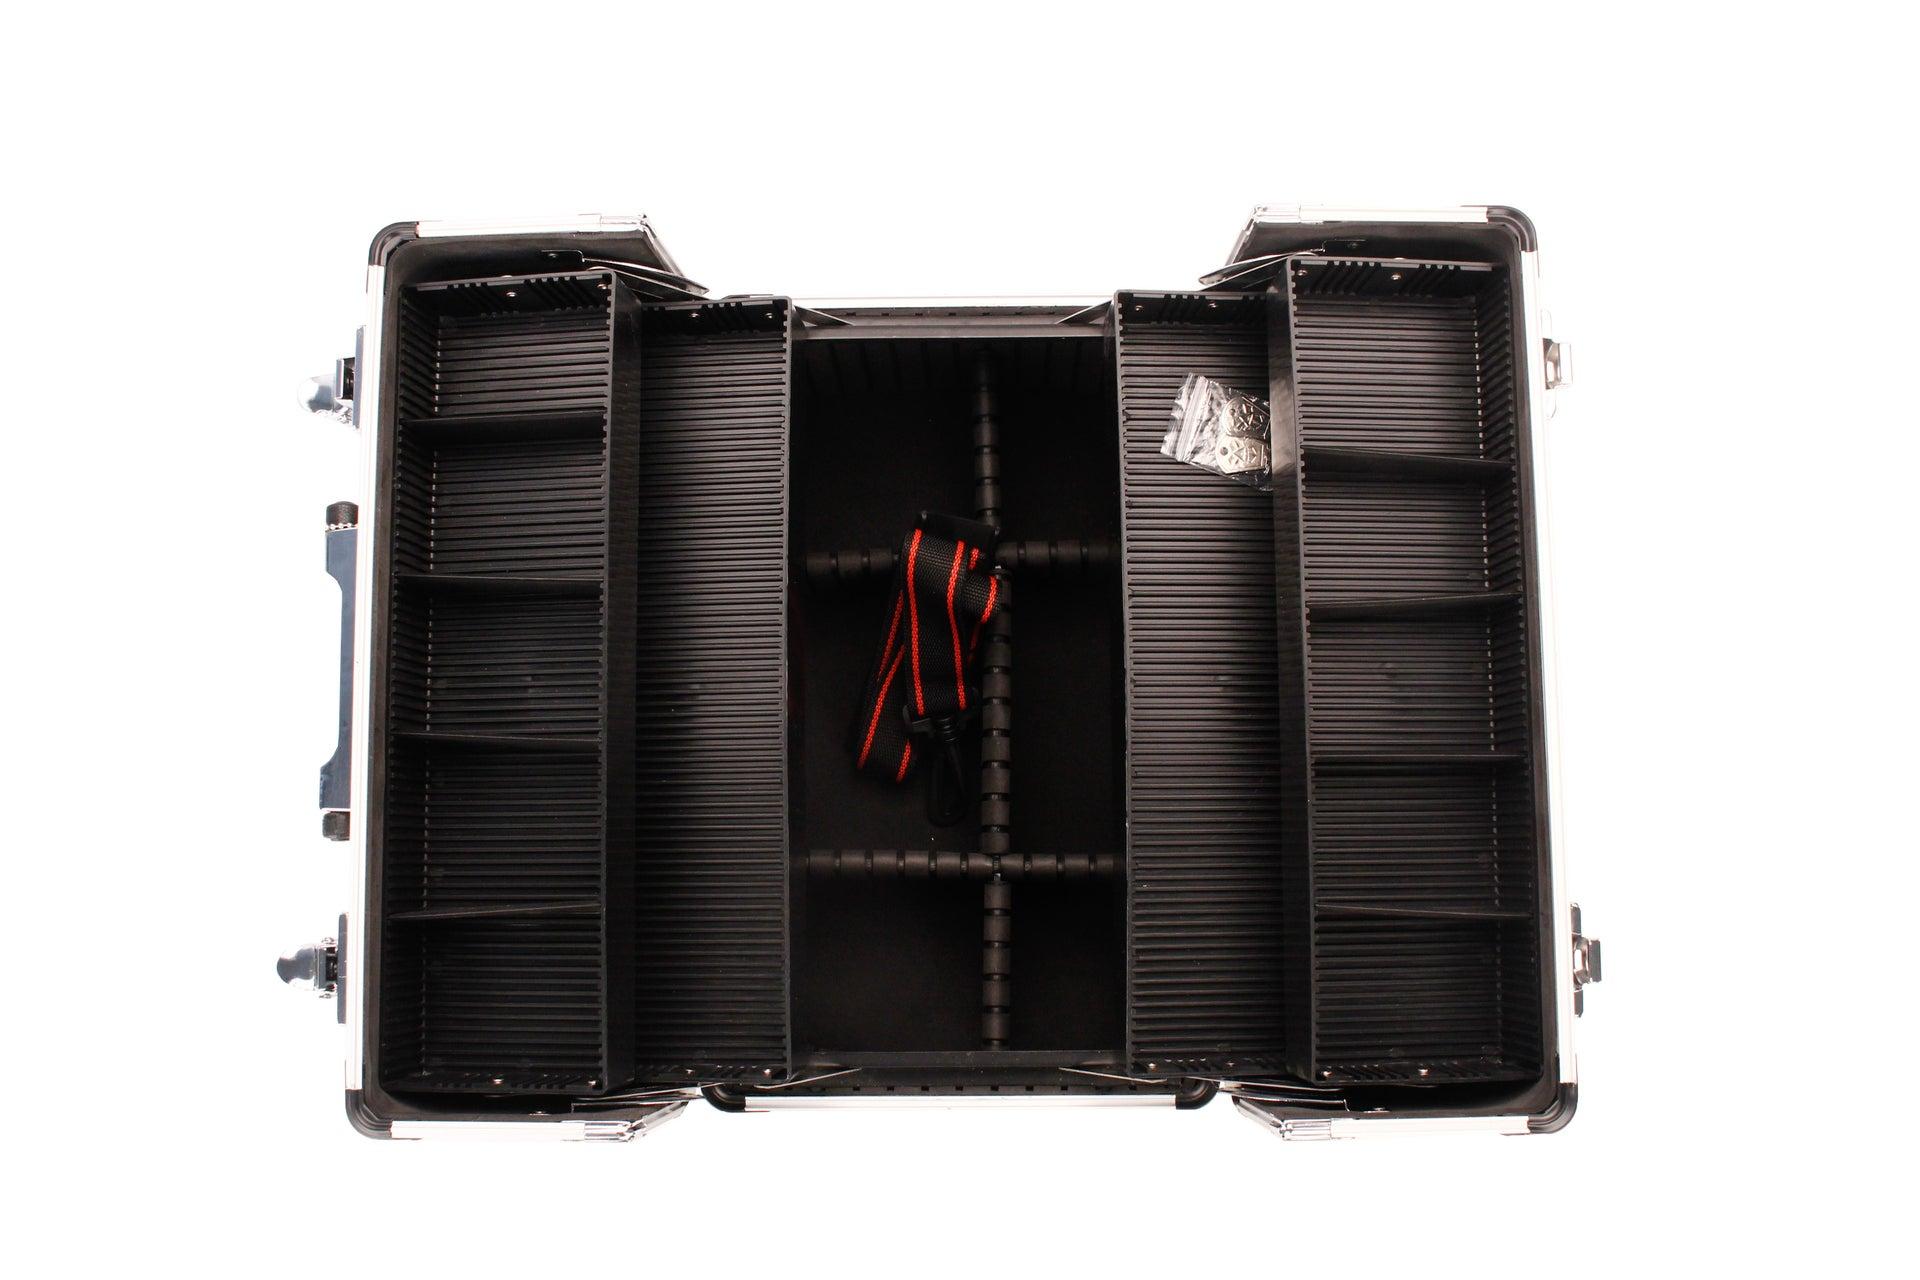 Cassetta attrezzi DEXTER L 22.5 x H 36.5 cm, profondità 250 mm - 5